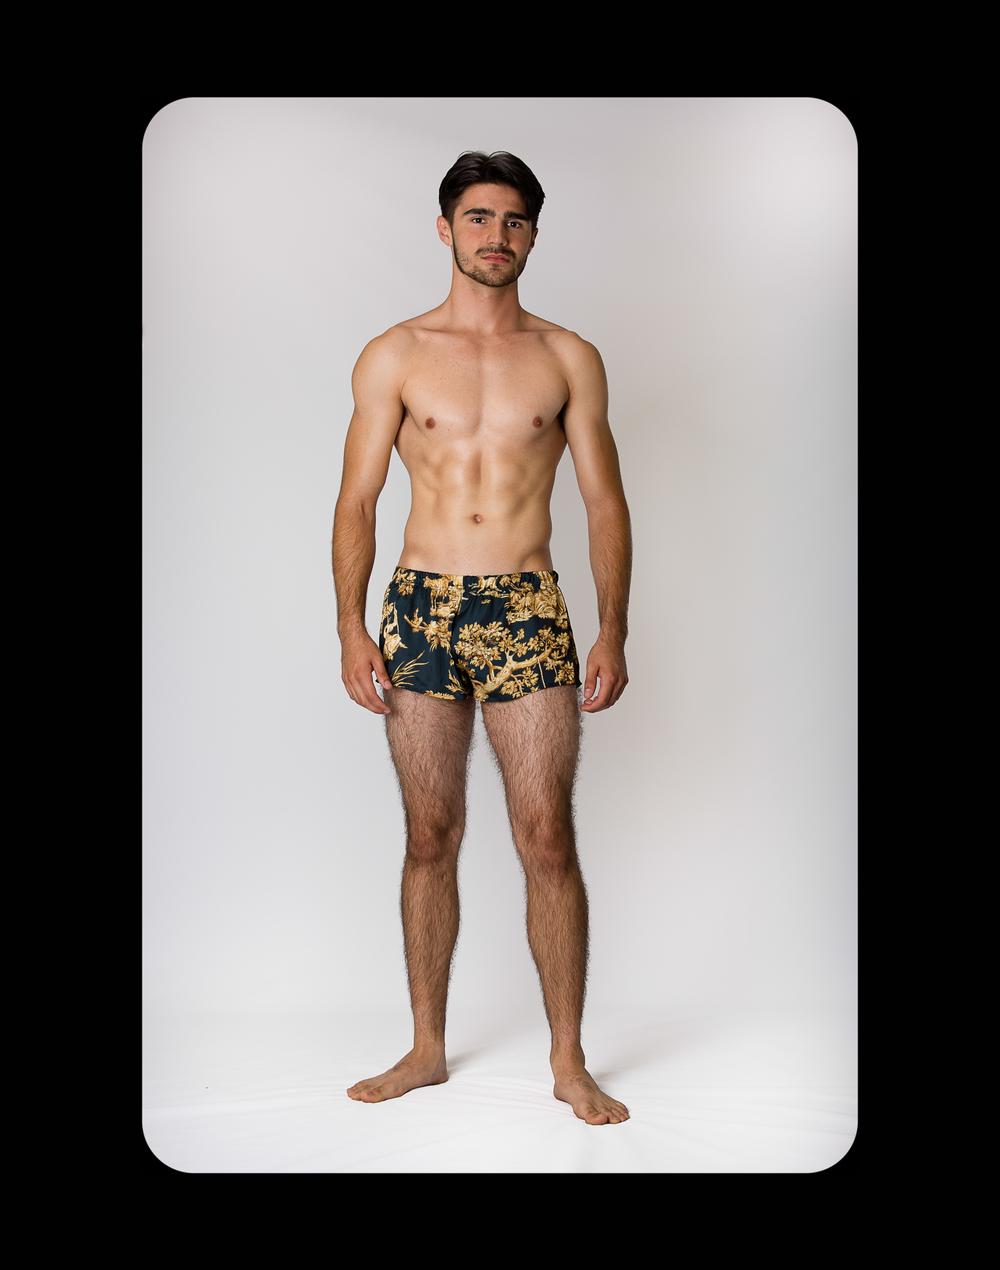 Raul Flores Desins Mens Underwear 2015-1 (dragged) 1.jpg